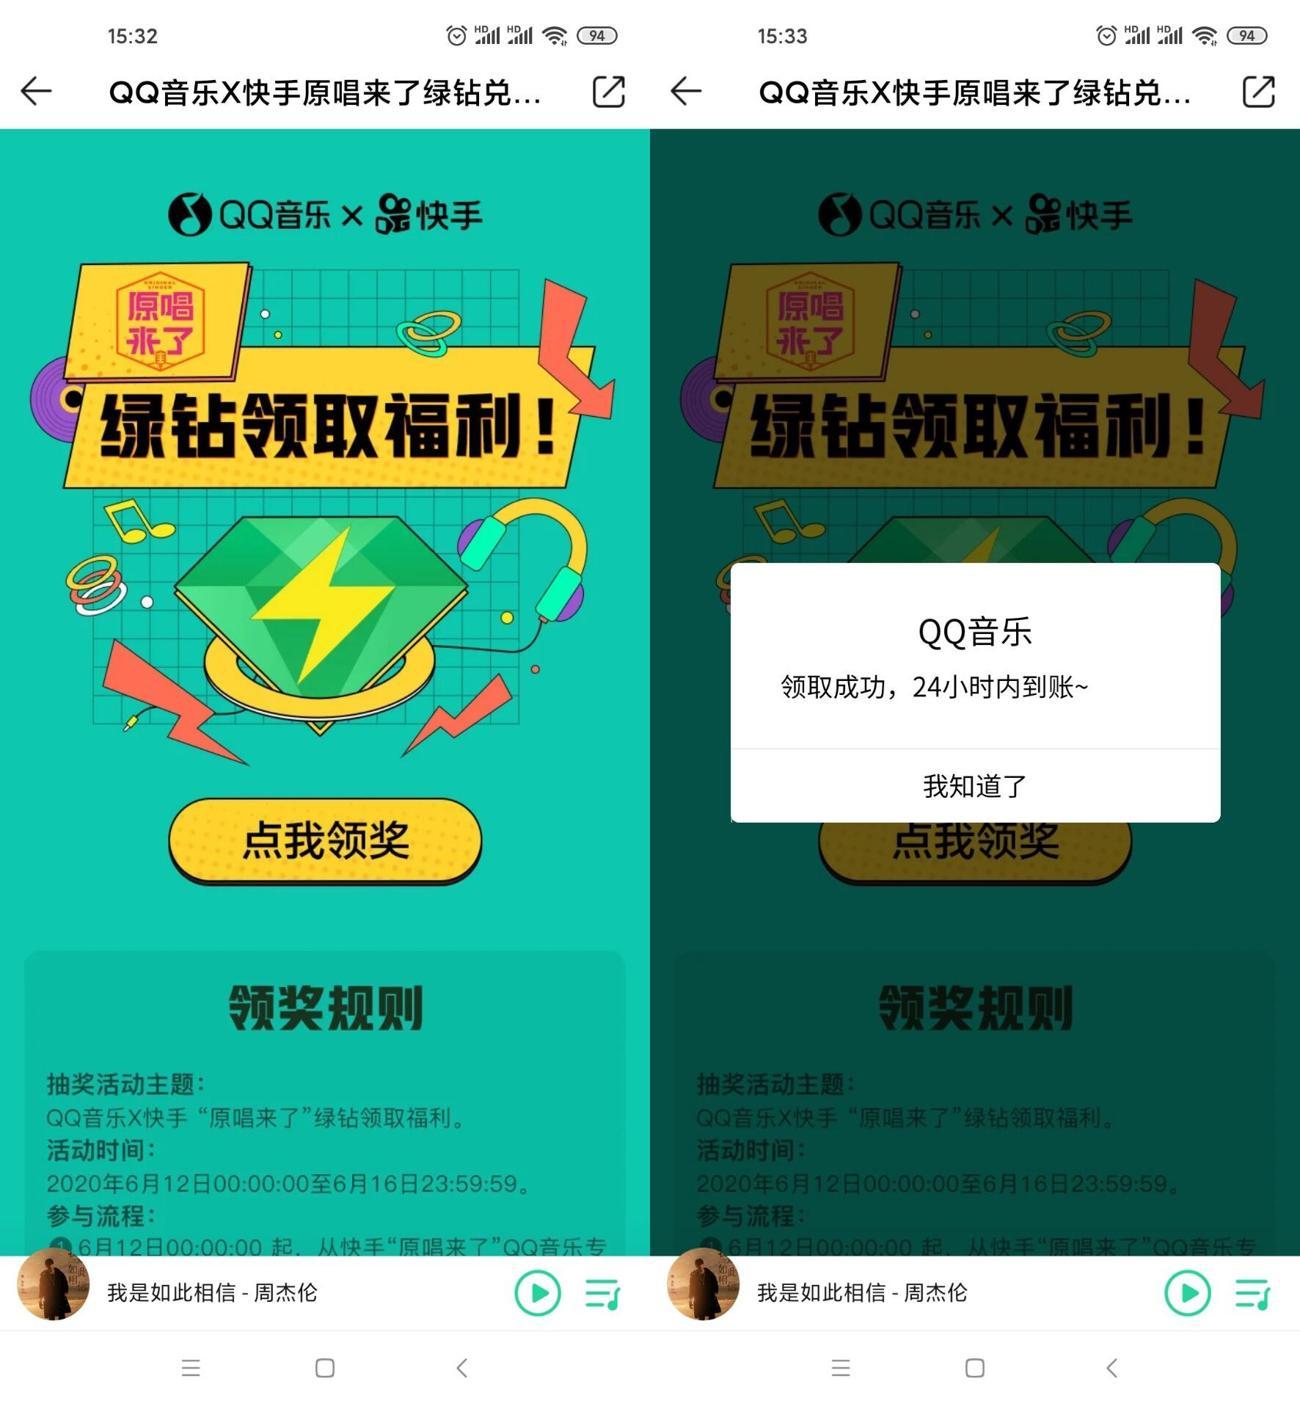 QQ音乐免费领3天豪华绿钻